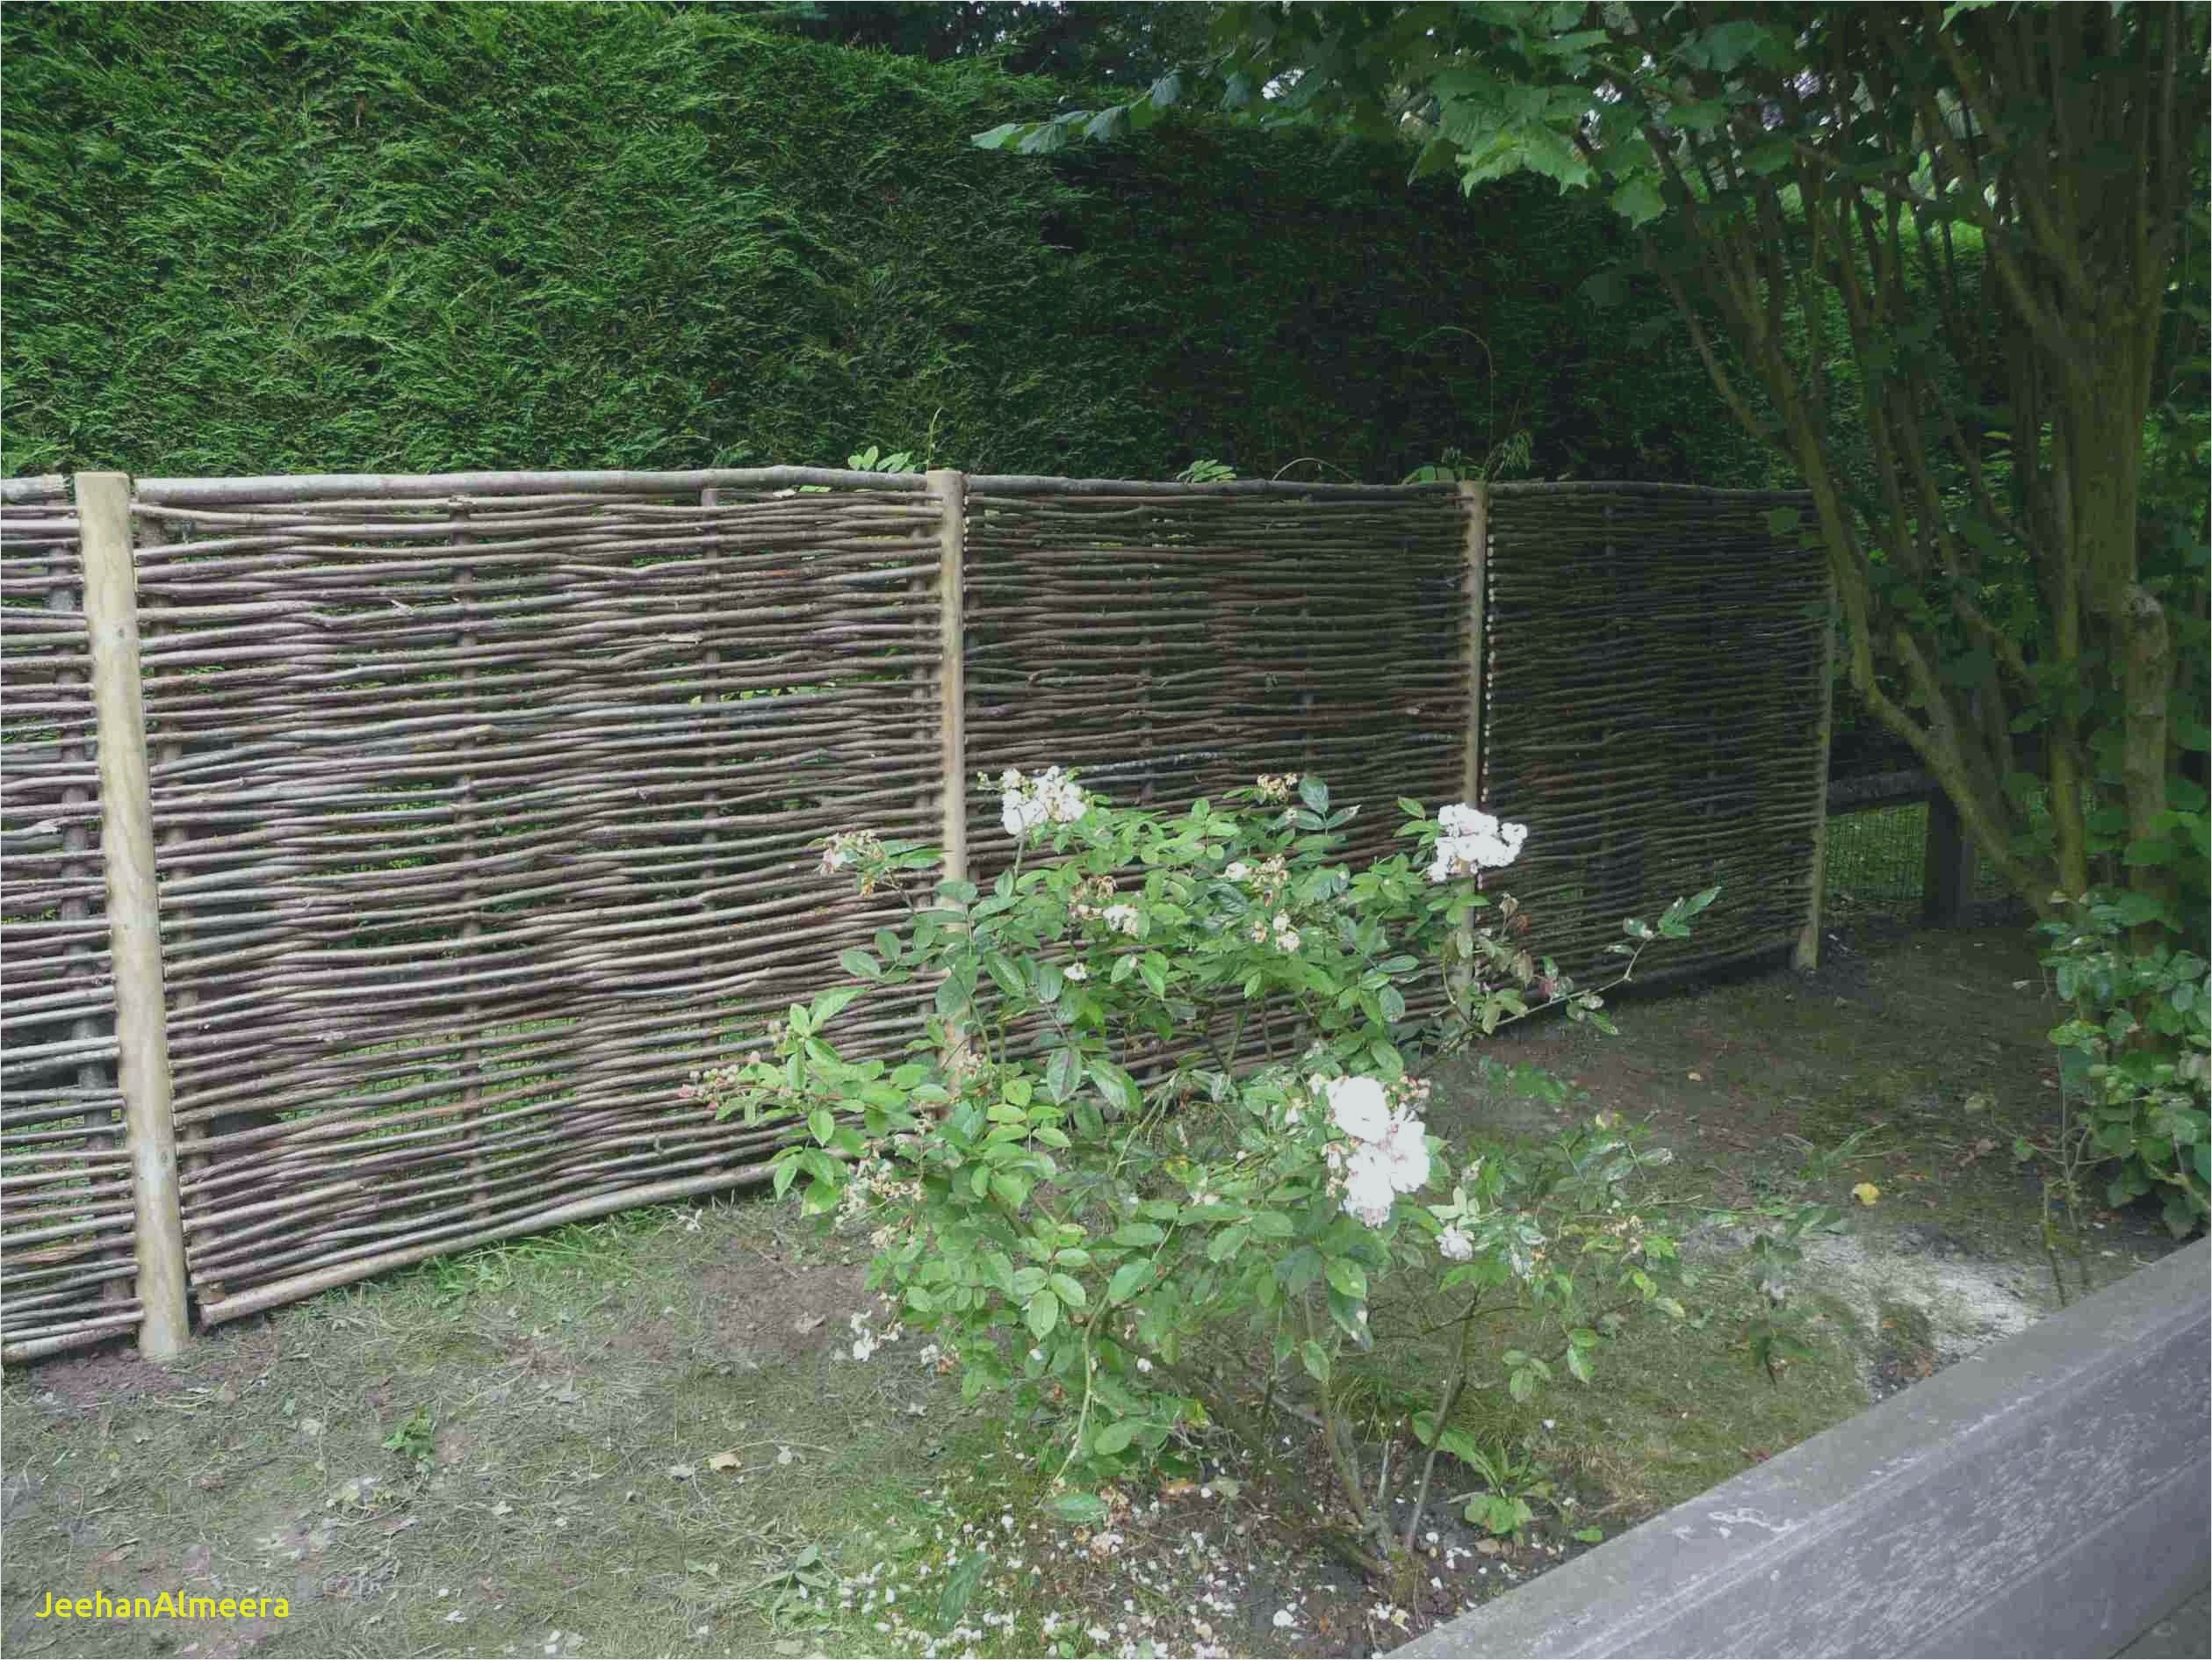 Abri De Jardin Metal Cdiscount Impressionnant Image Cloture De Piscine Nouveau Abri De Jardin Metal Cdiscount Frais